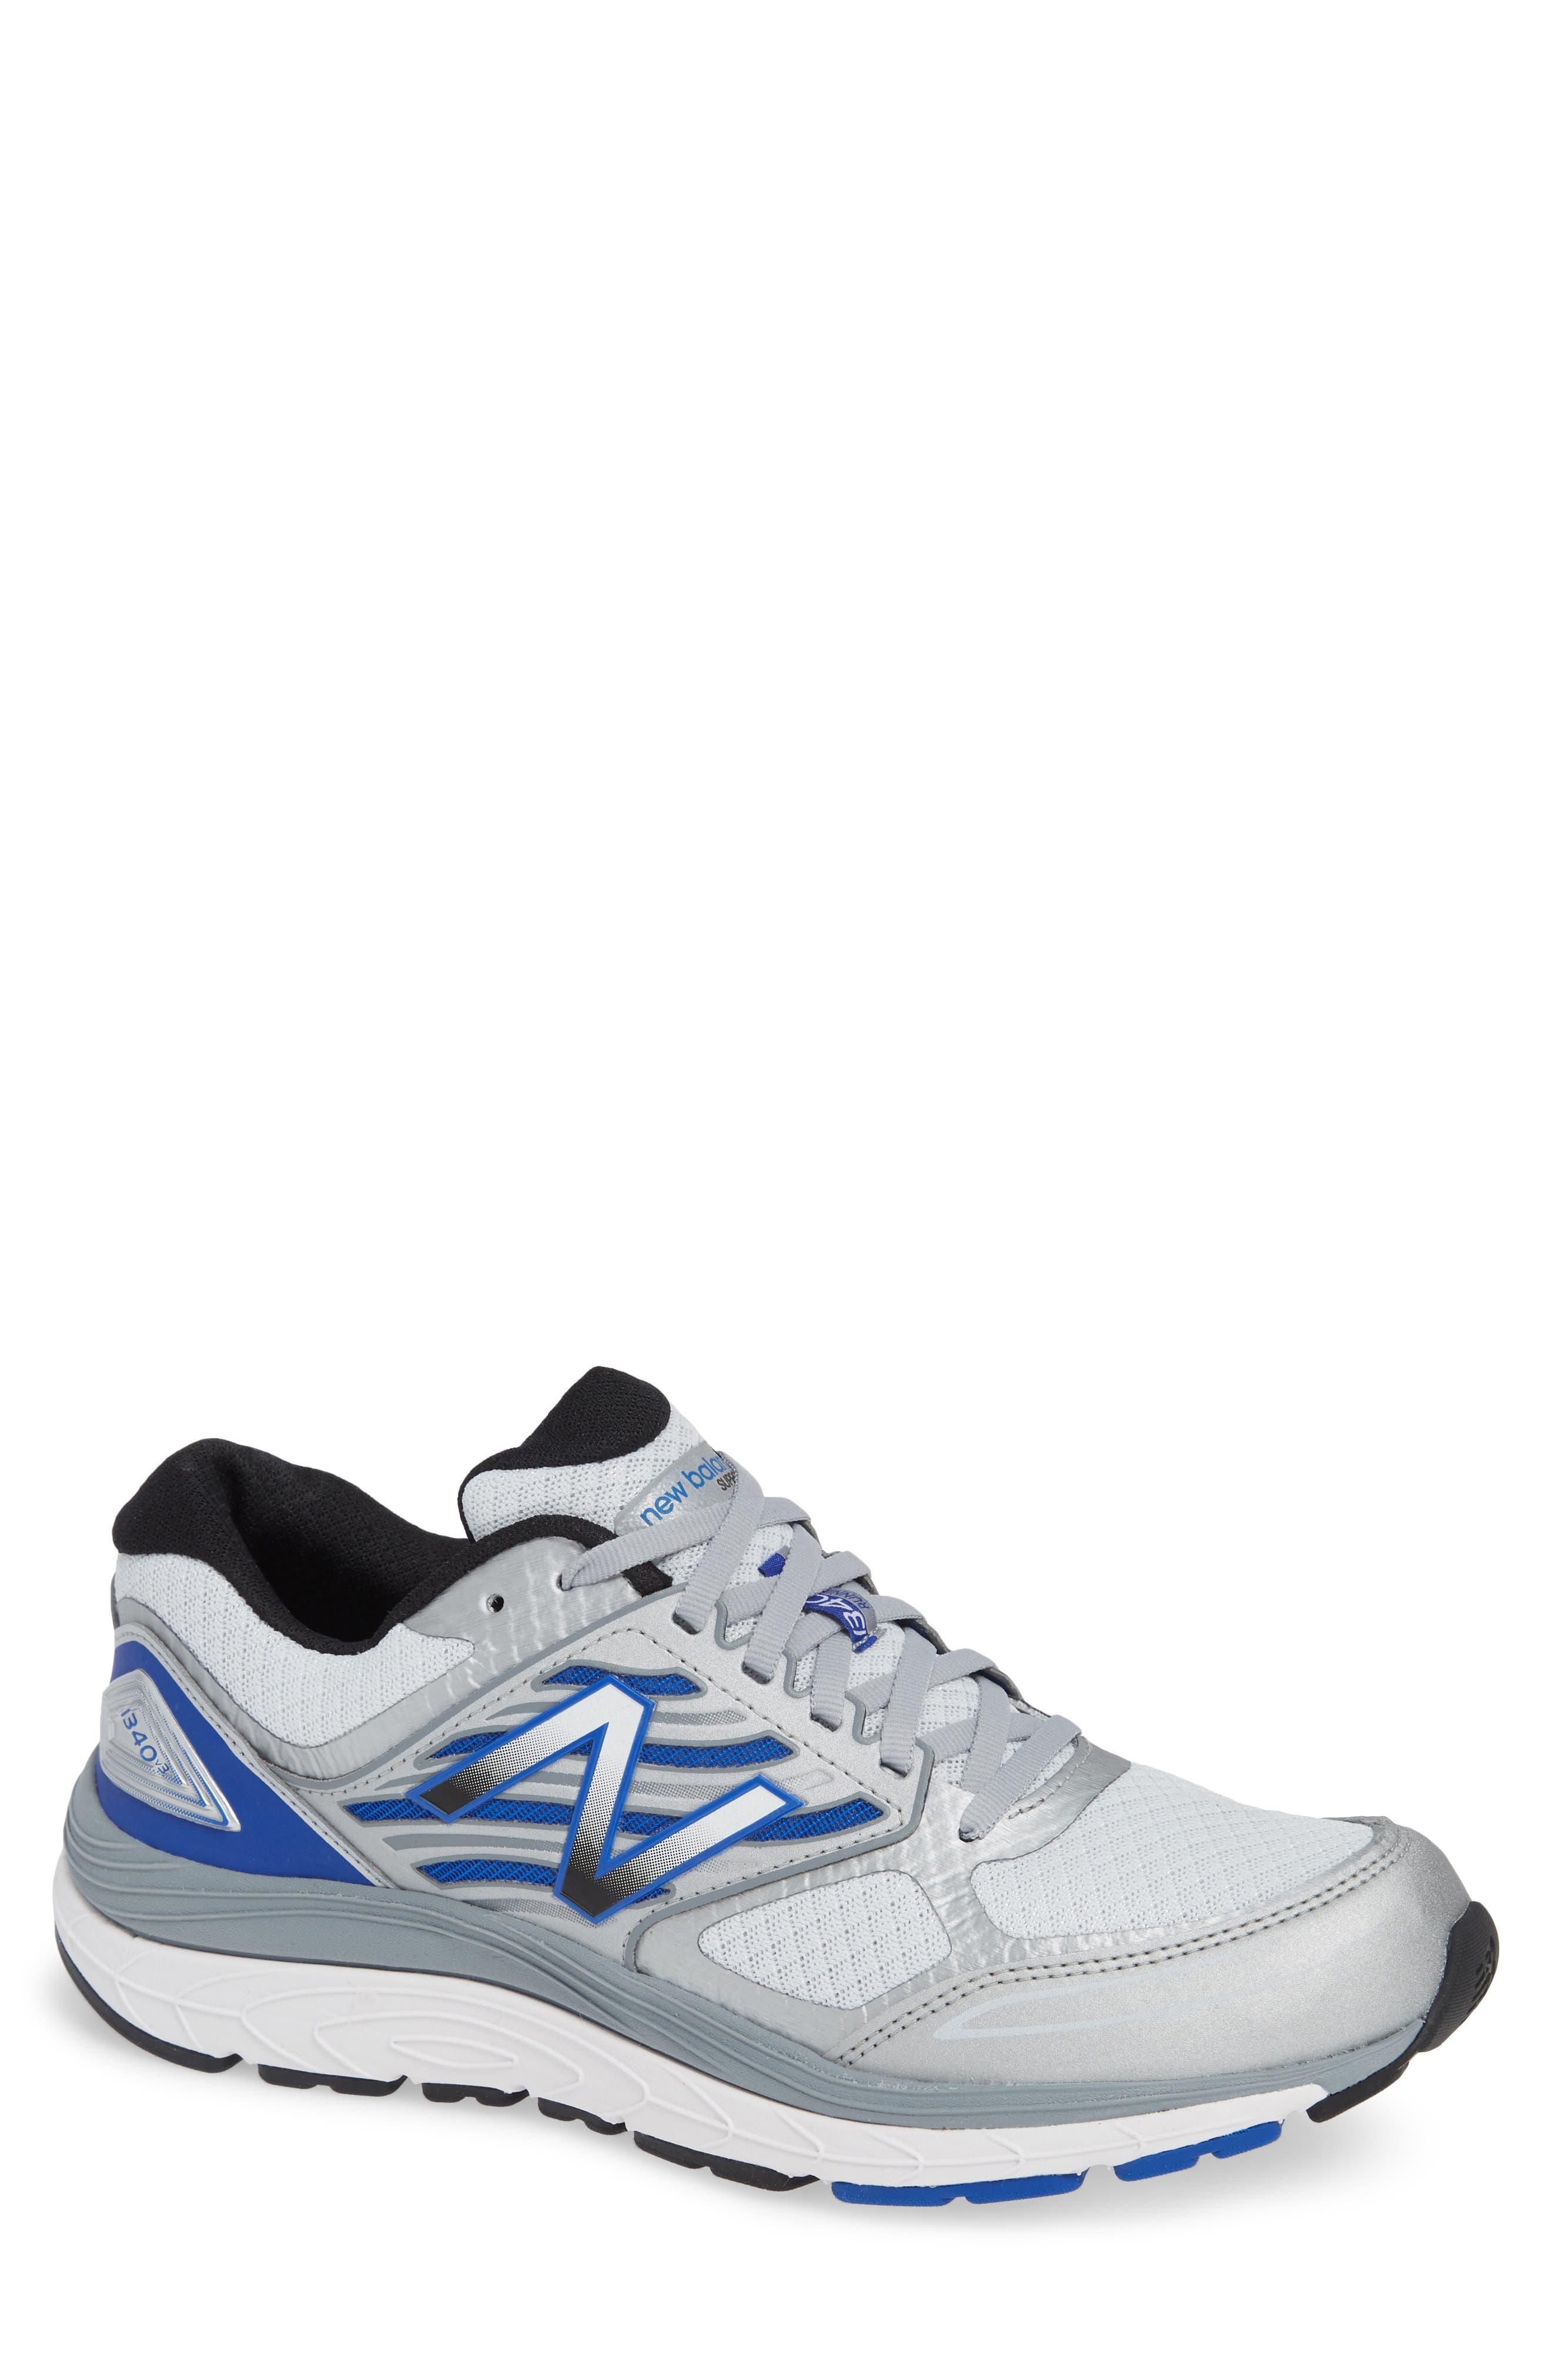 NEW BALANCE, 1340v3 Running Shoe, Main thumbnail 1, color, WHITE